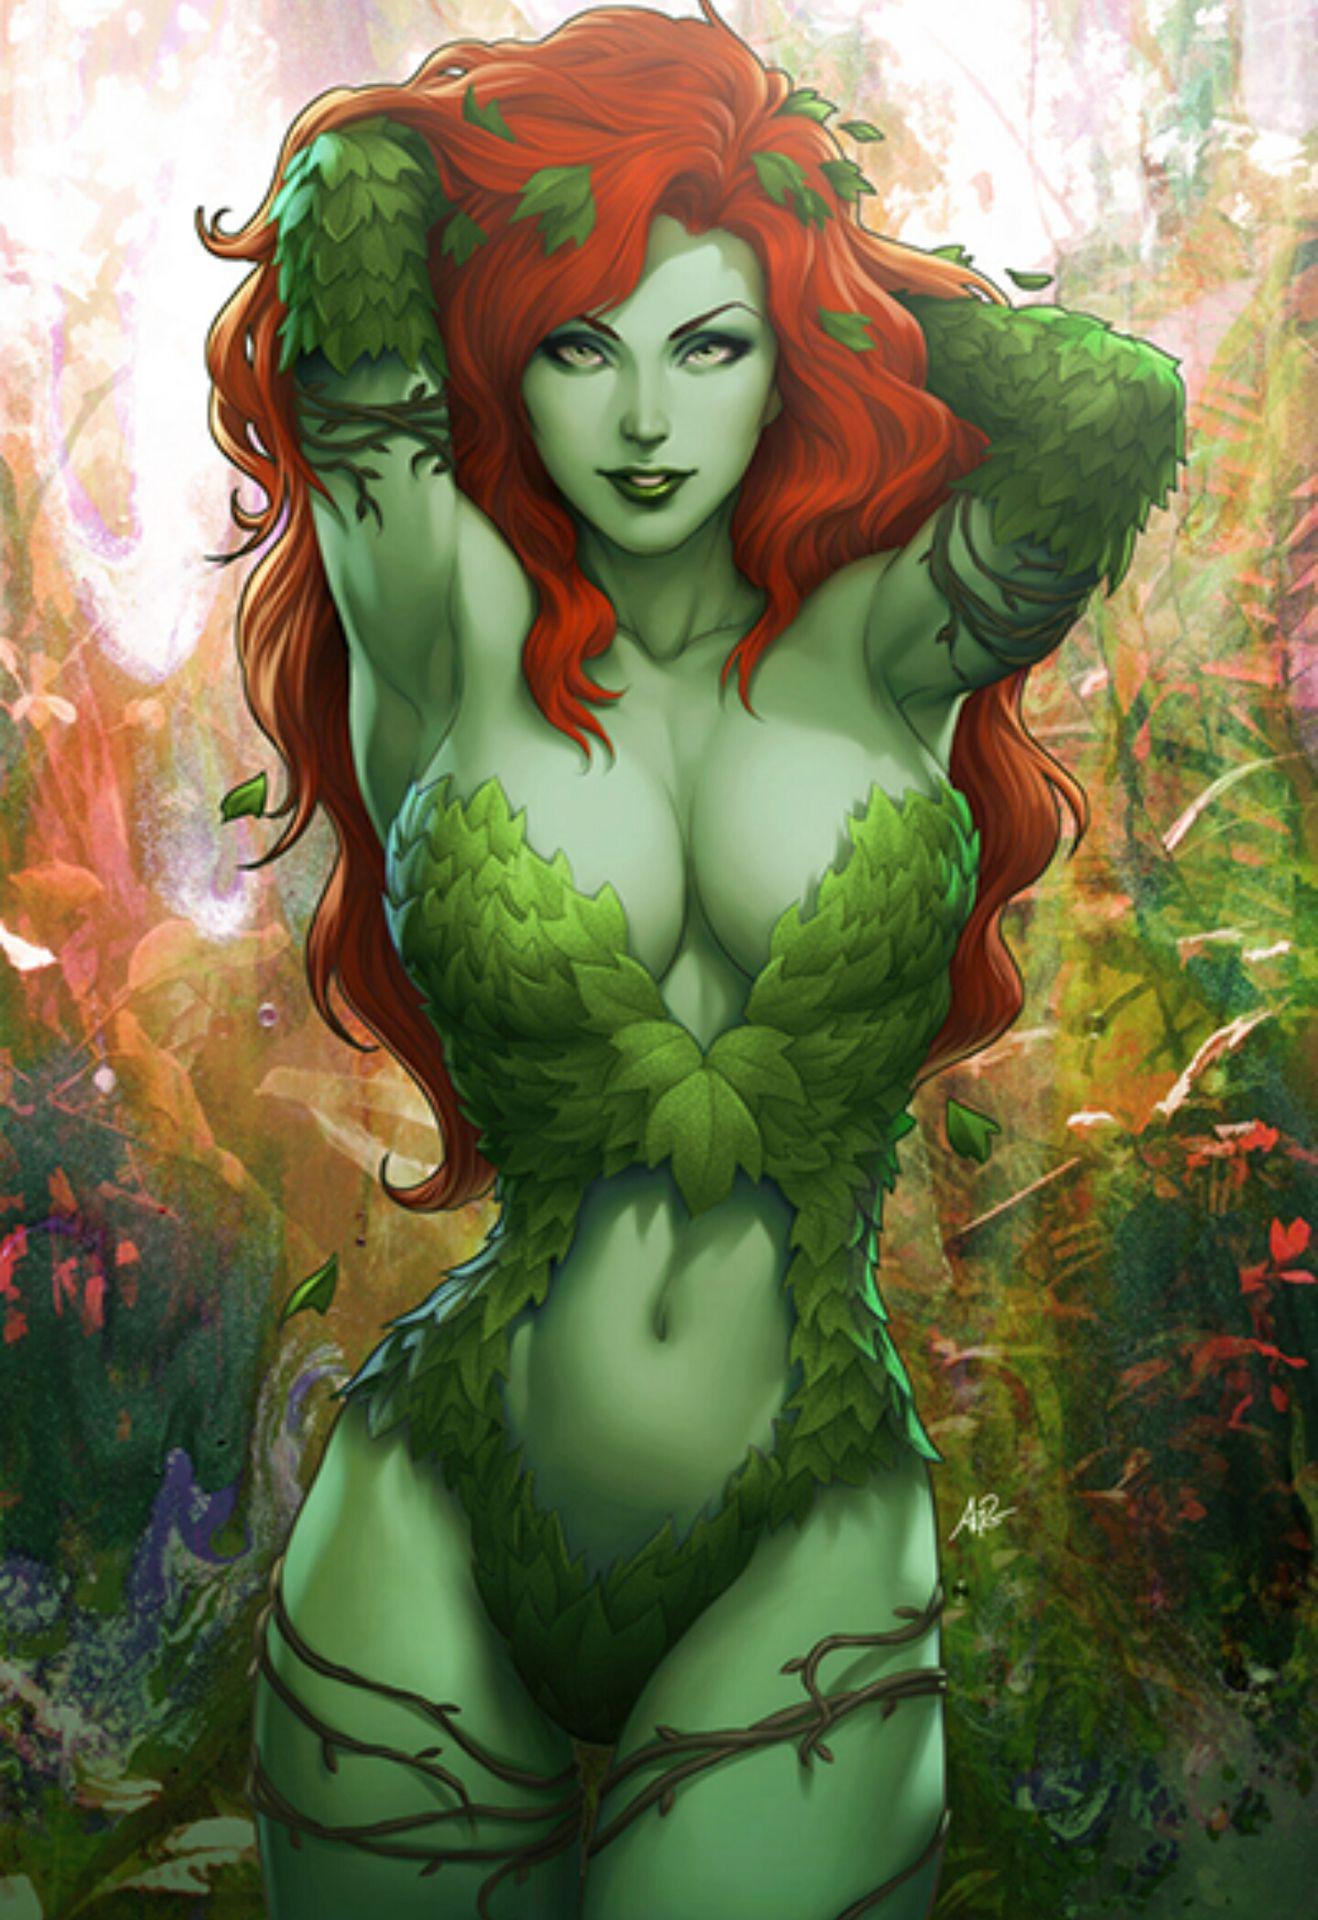 Poison Ivy | Villains Wiki | FANDOM powered by Wikia